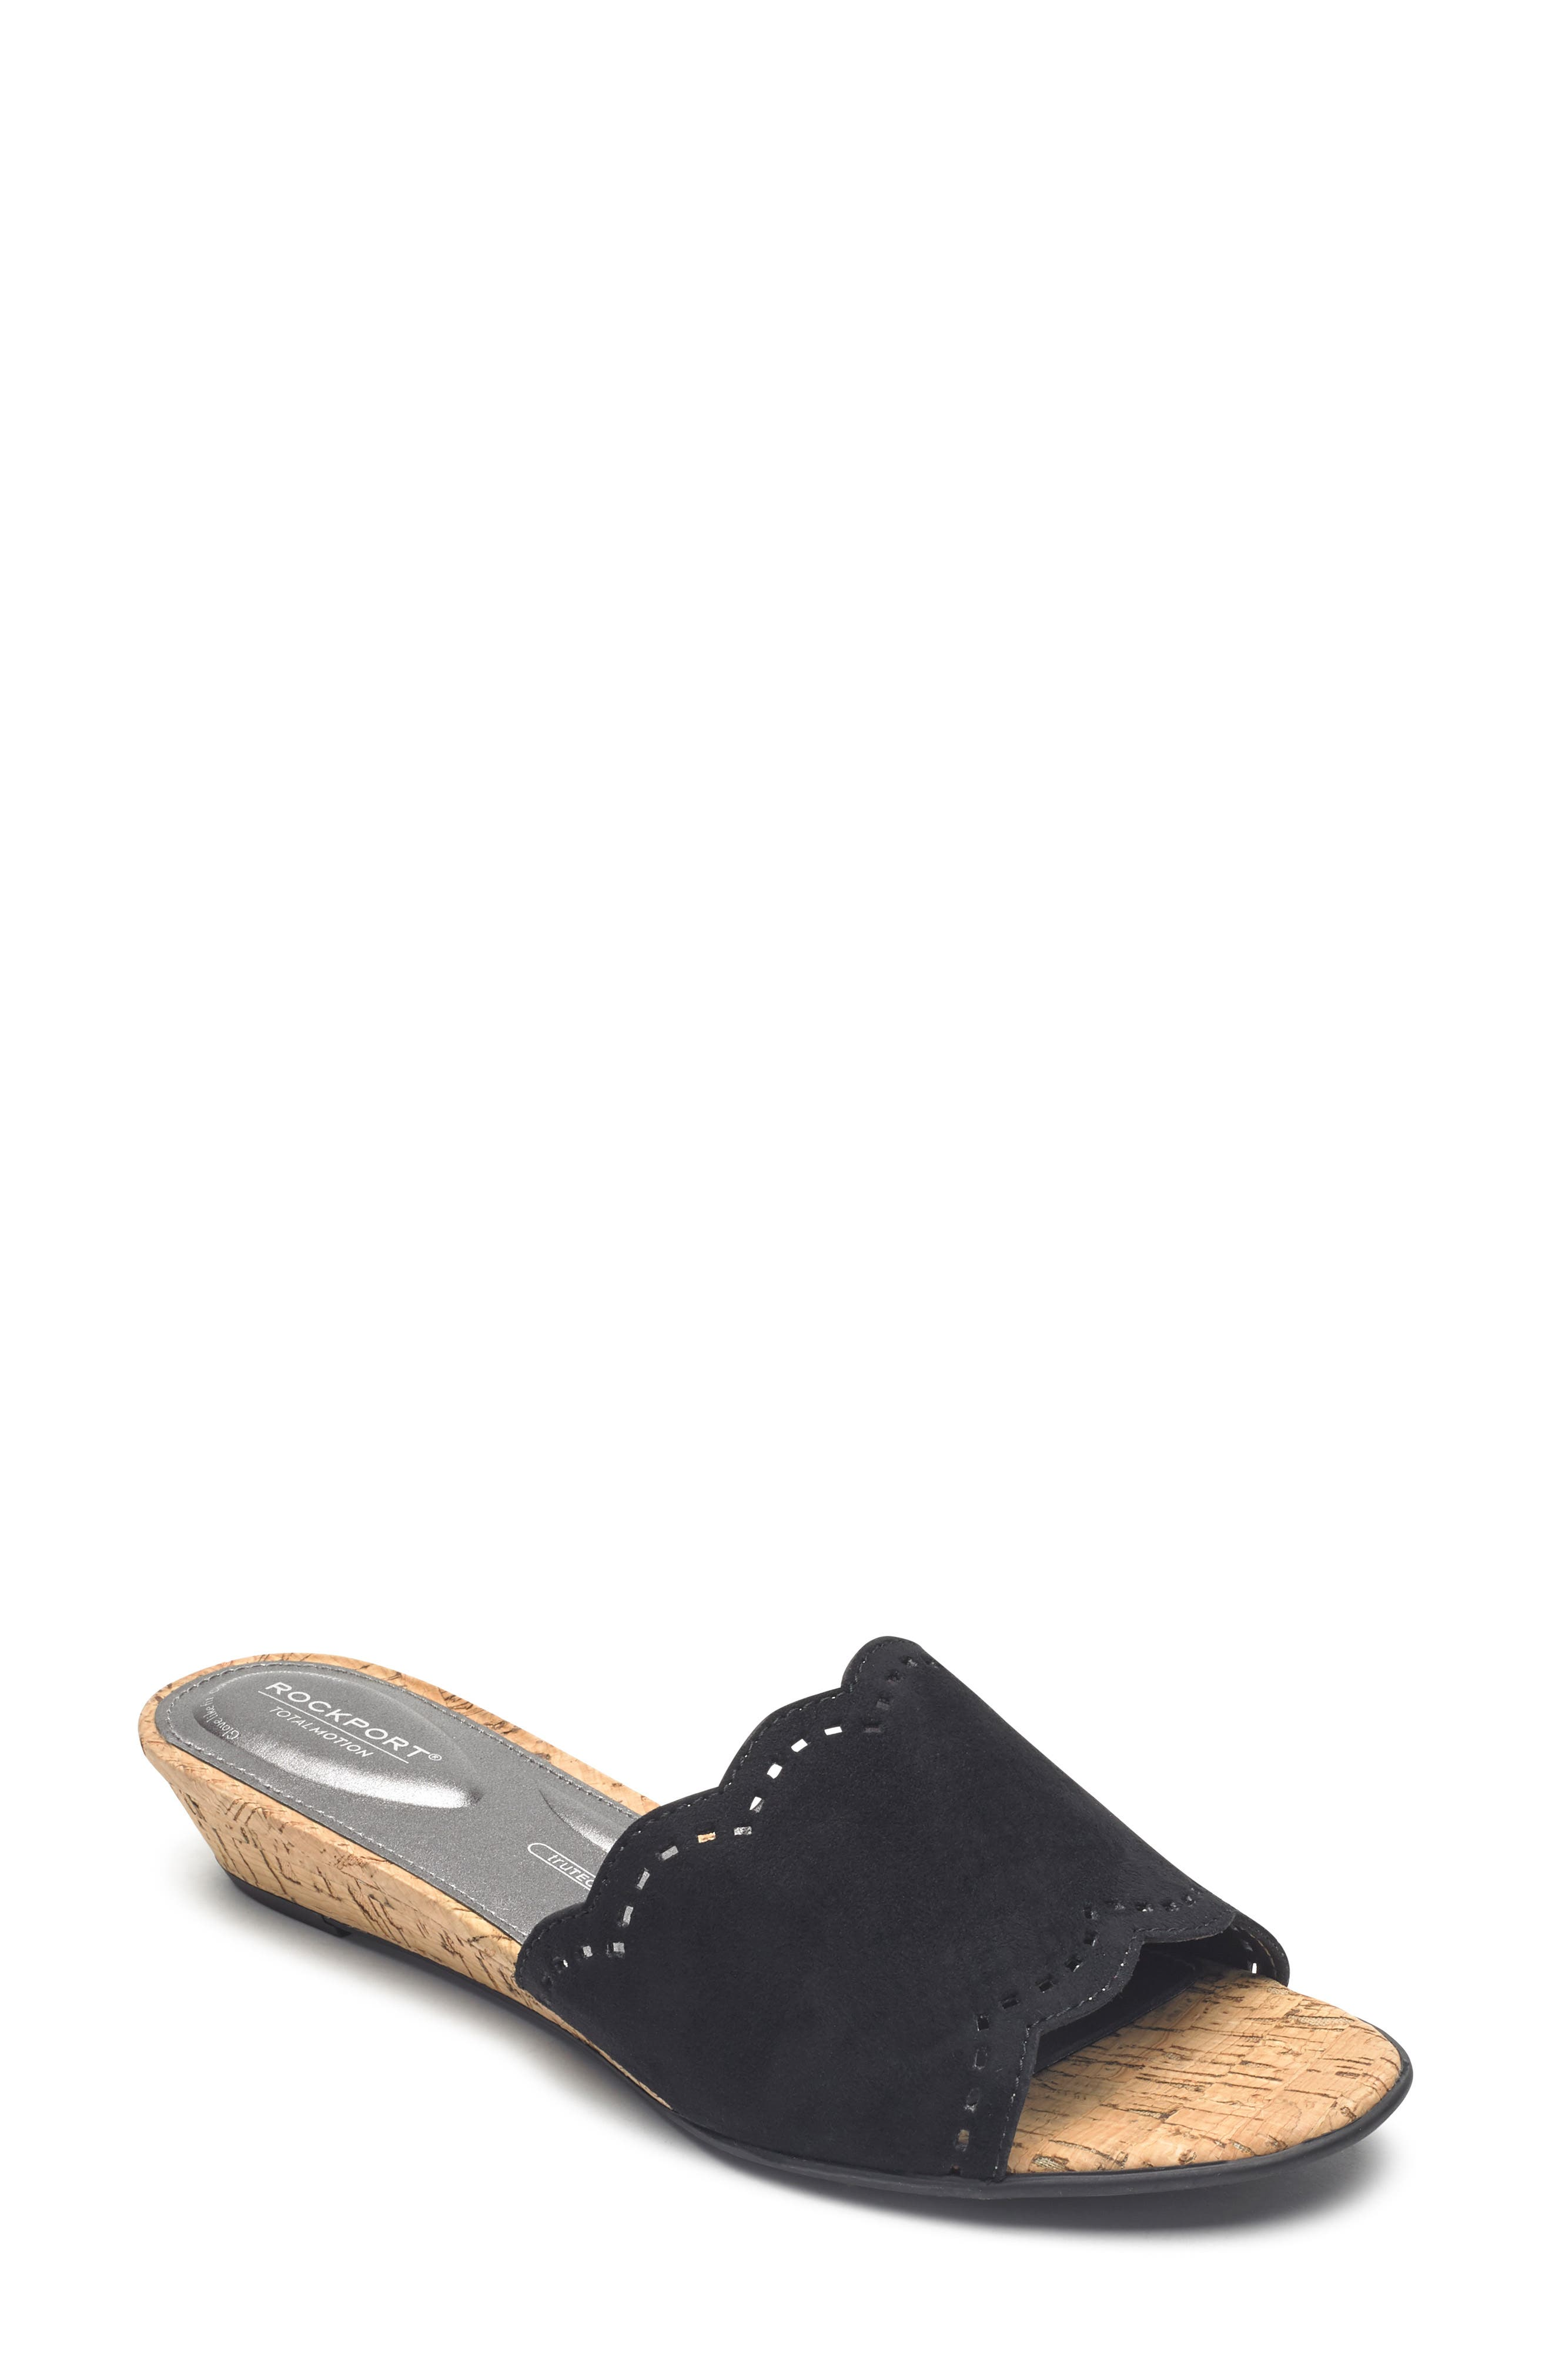 Zandra Total Motion<sup>®</sup> Slide Sandal,                             Main thumbnail 1, color,                             BLACK SUEDE